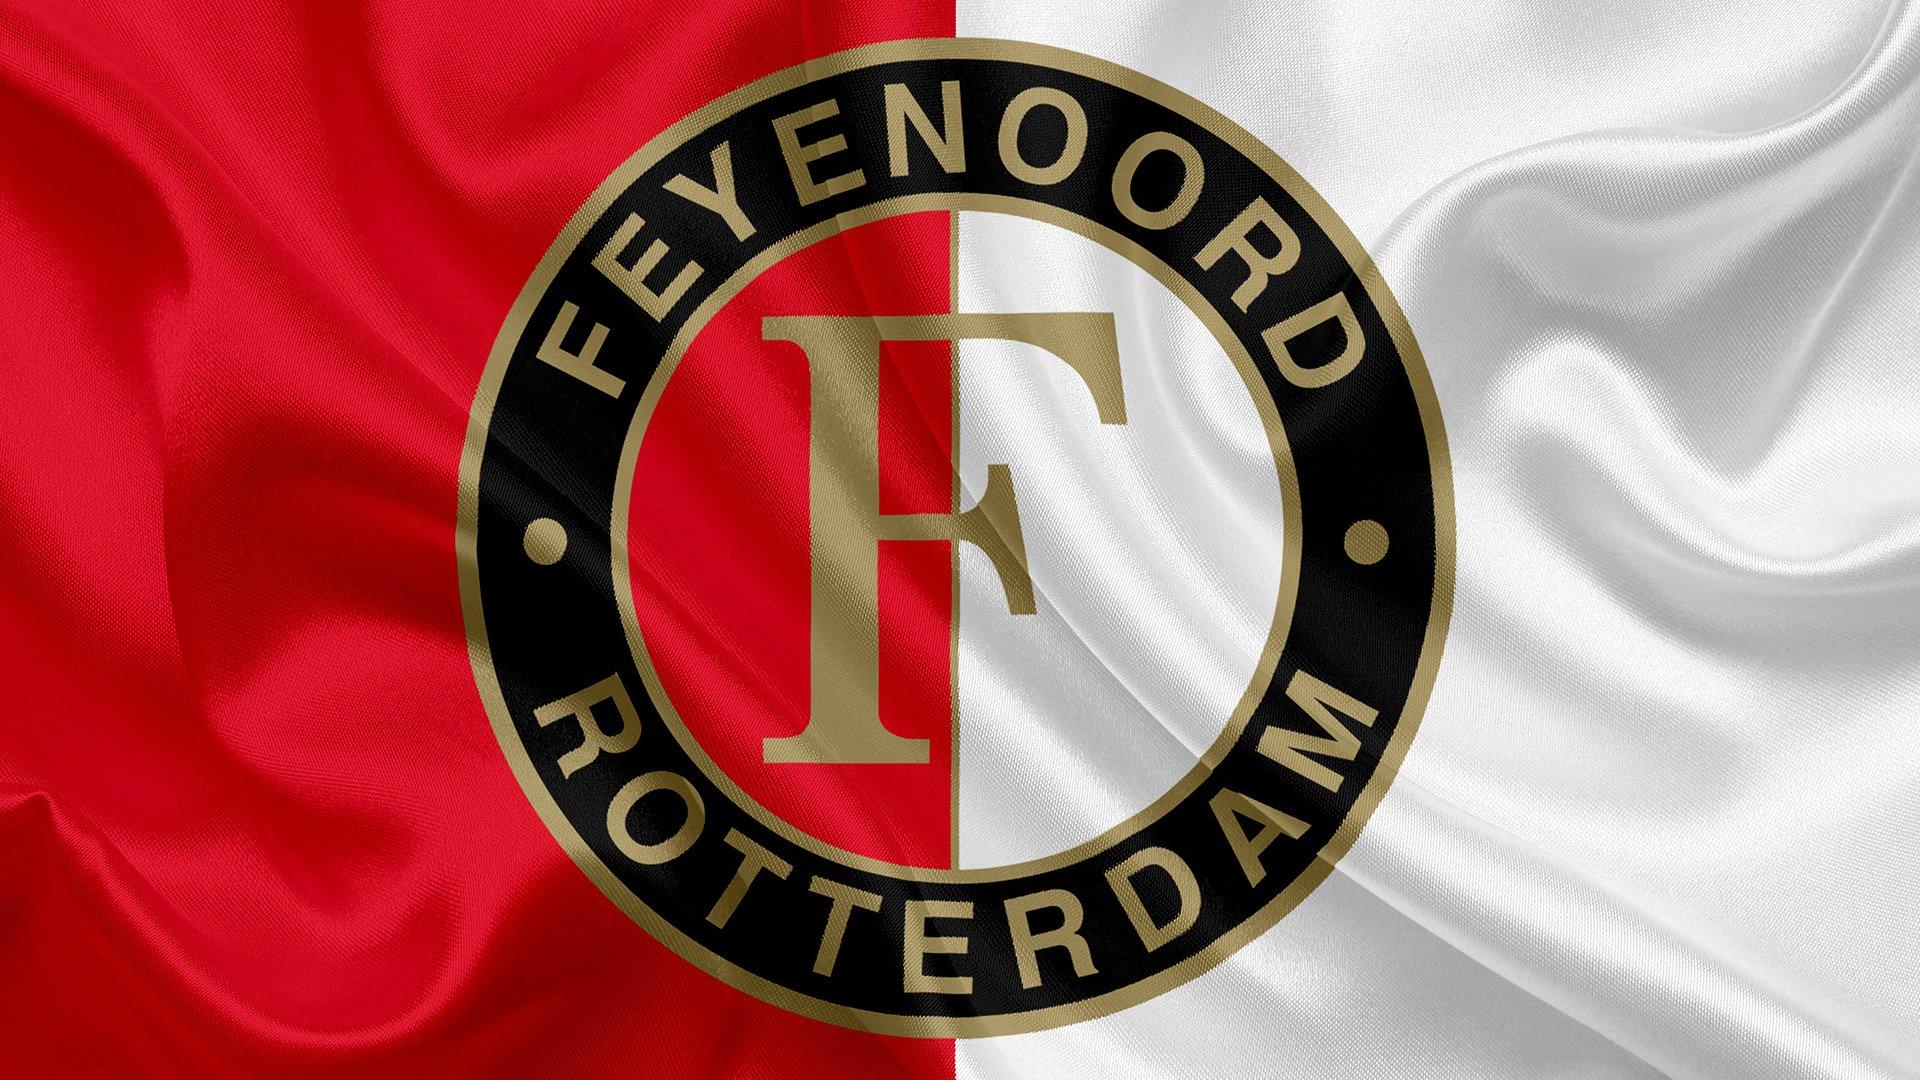 feyenoord logo feyenoord symbol meaning history and